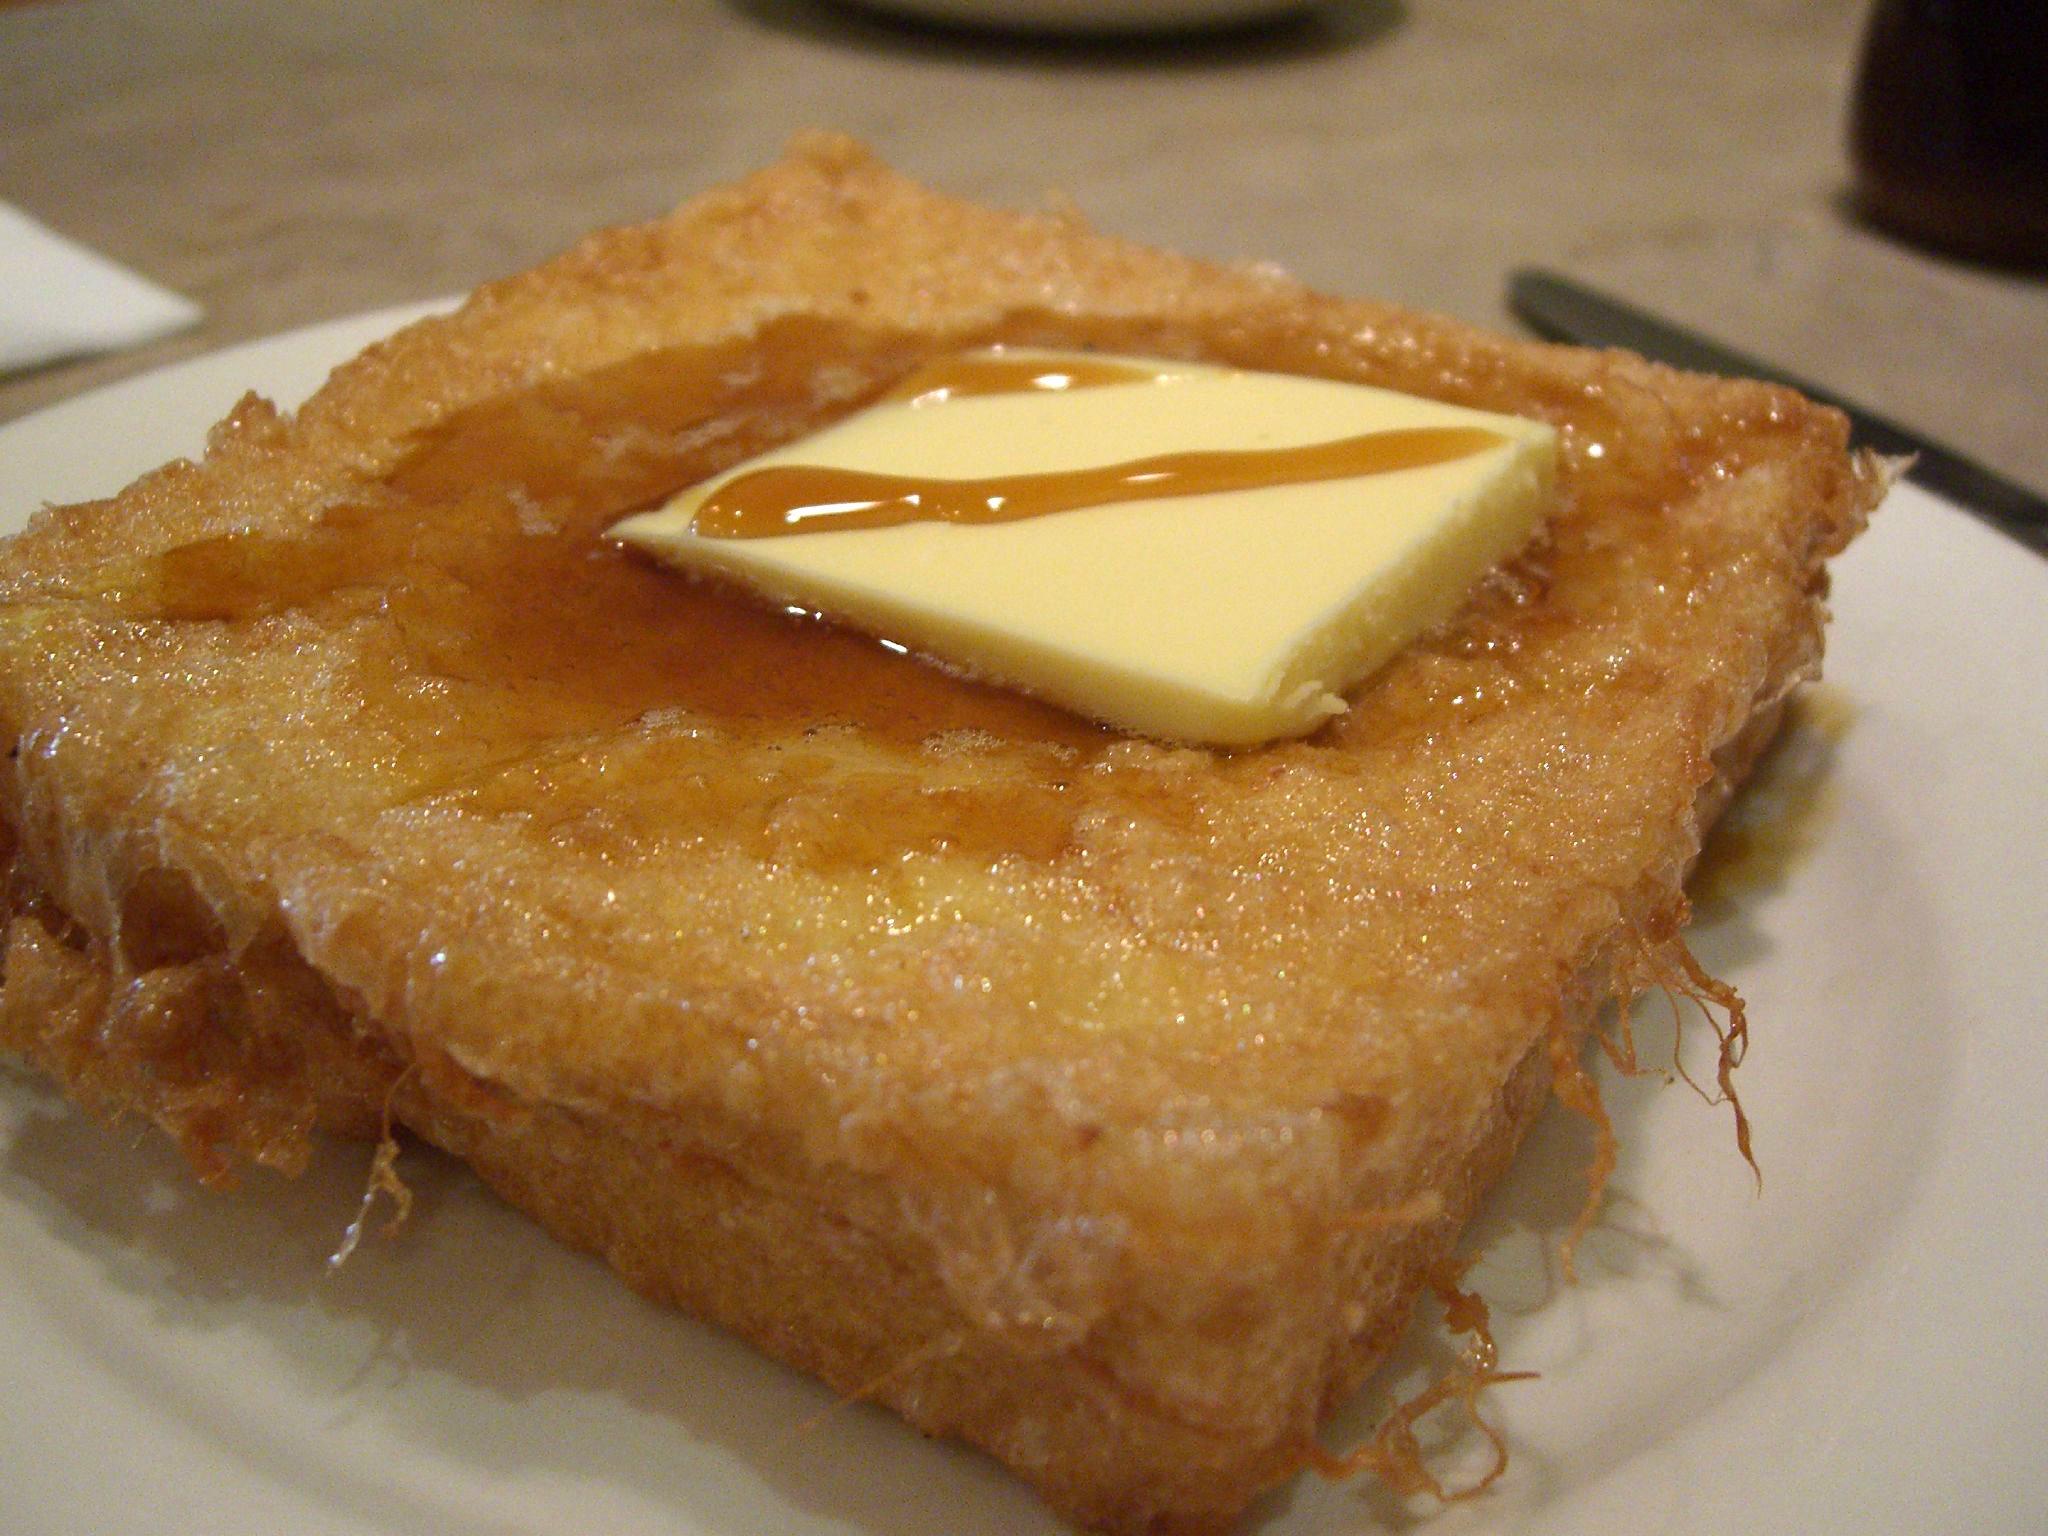 Chinese cuisines culture essay food popular